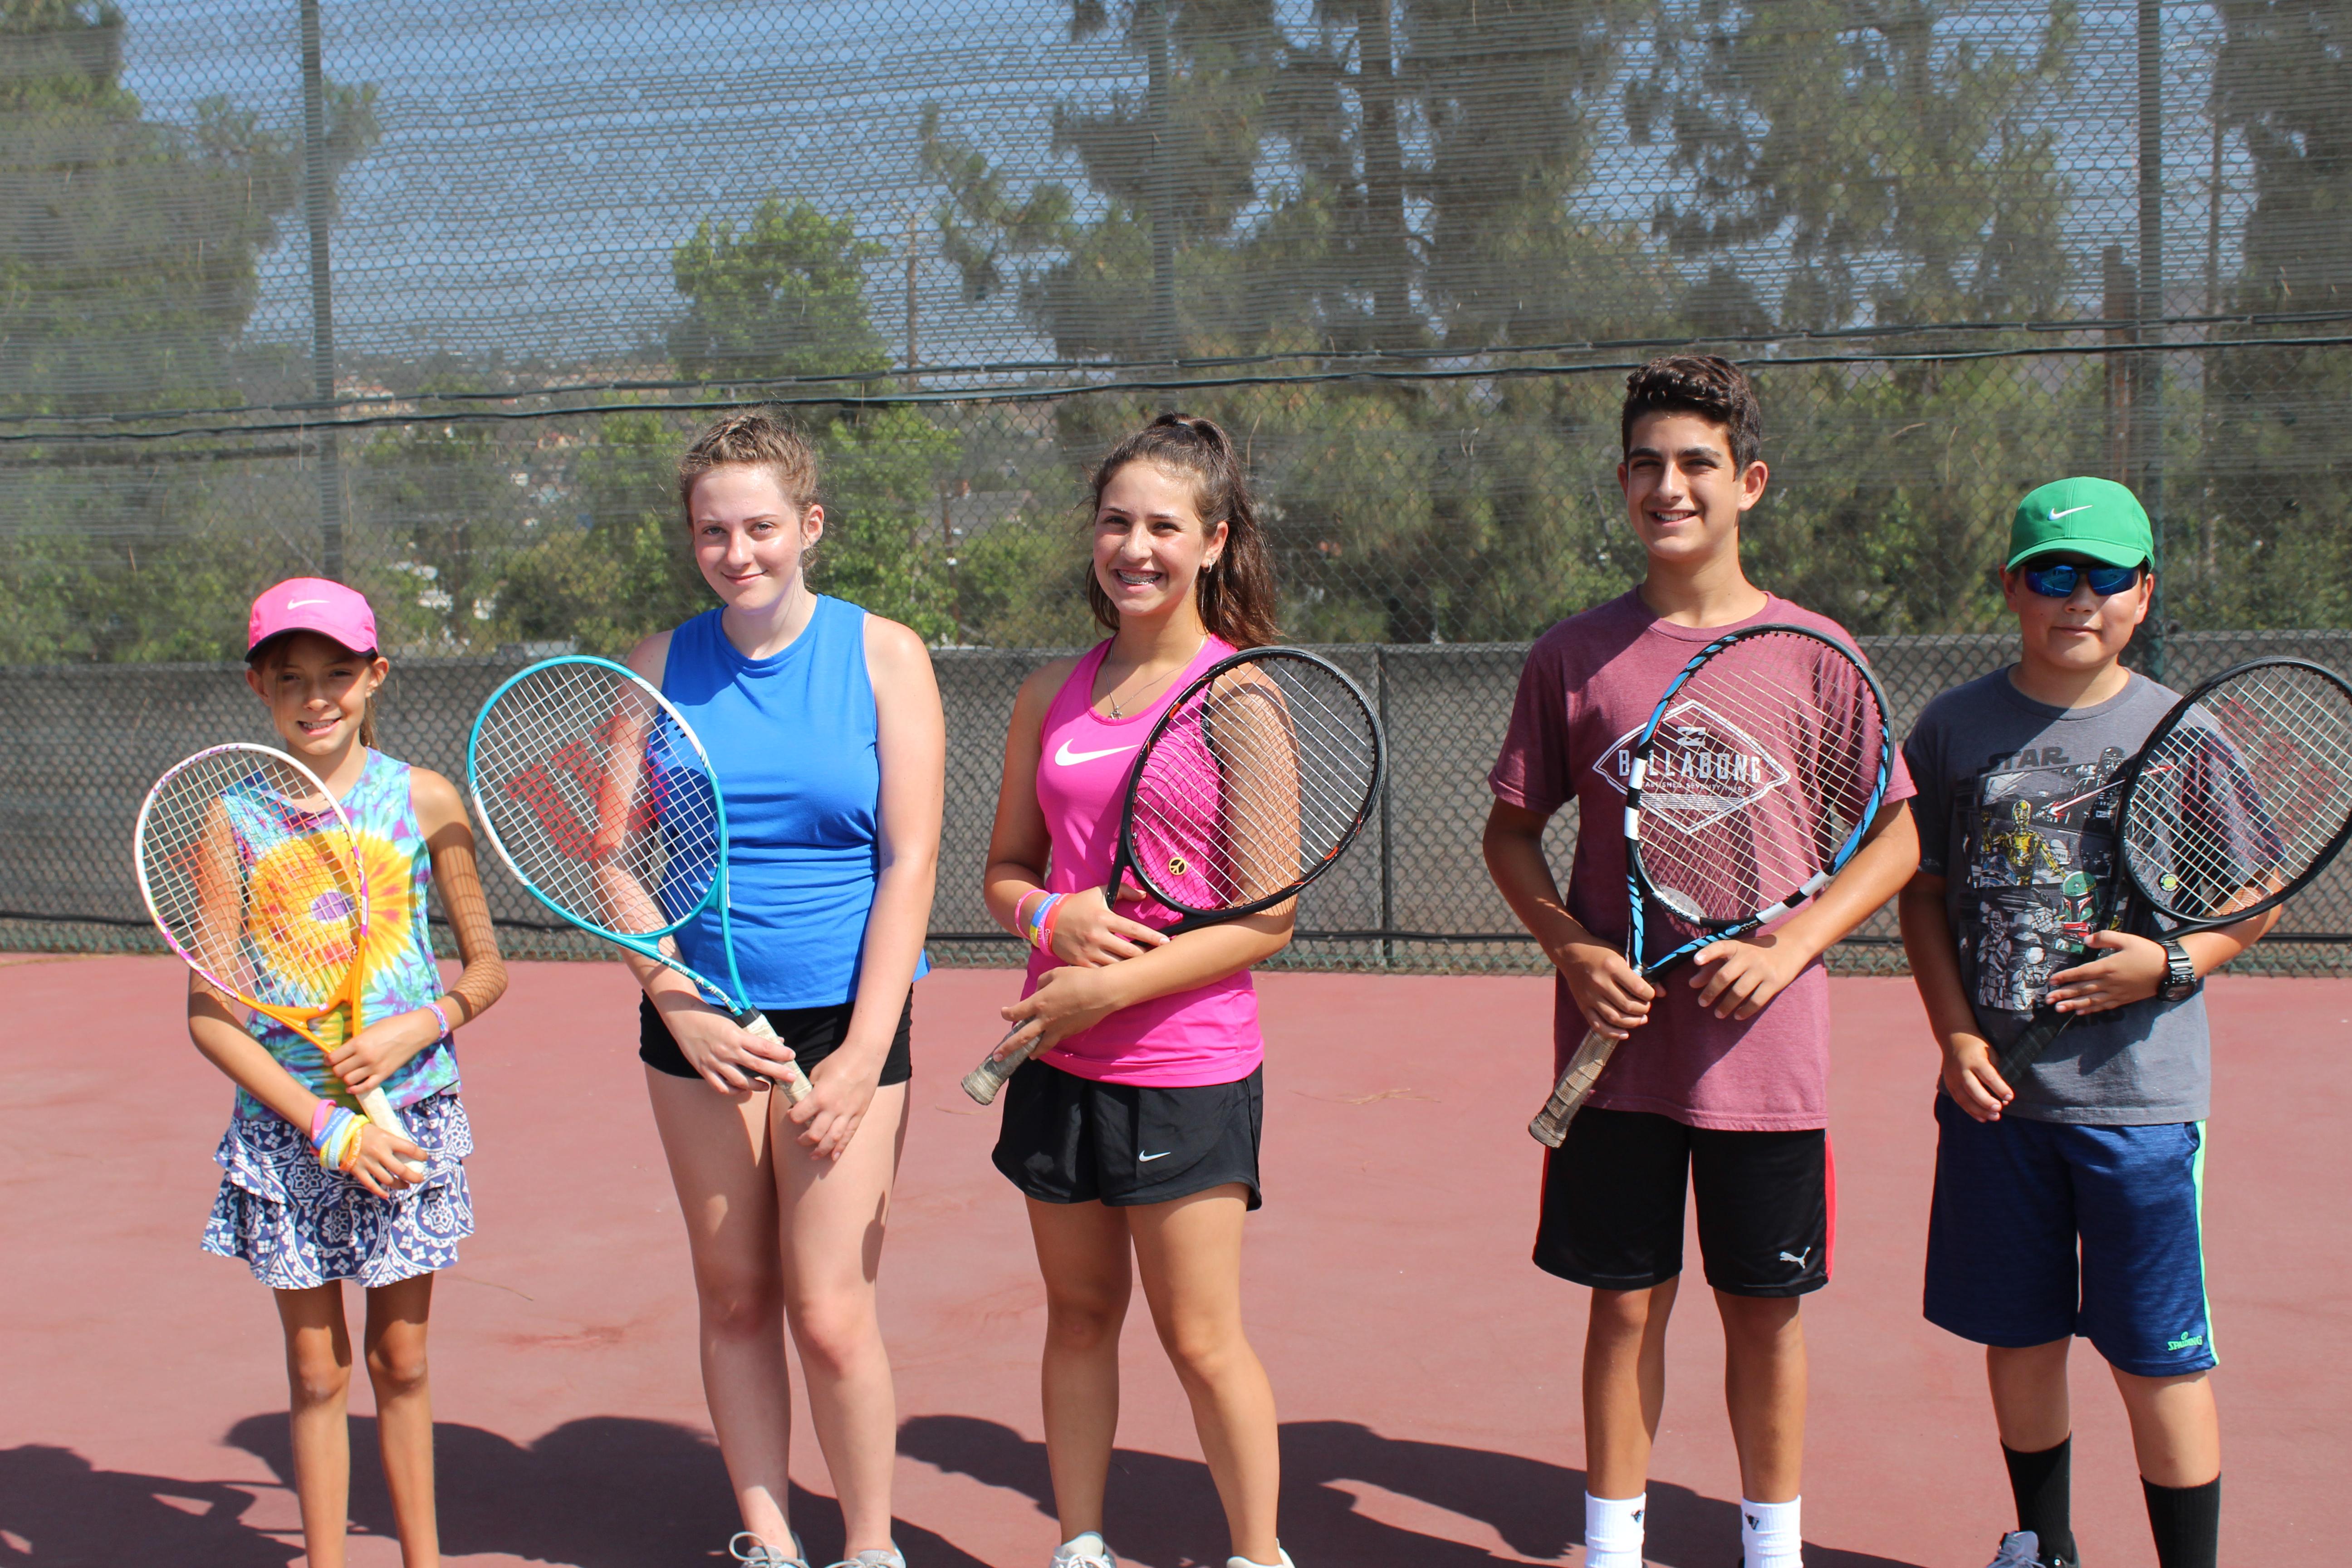 Summer Program - Multi-Sport | URJ 6 Points Sports Academy - California